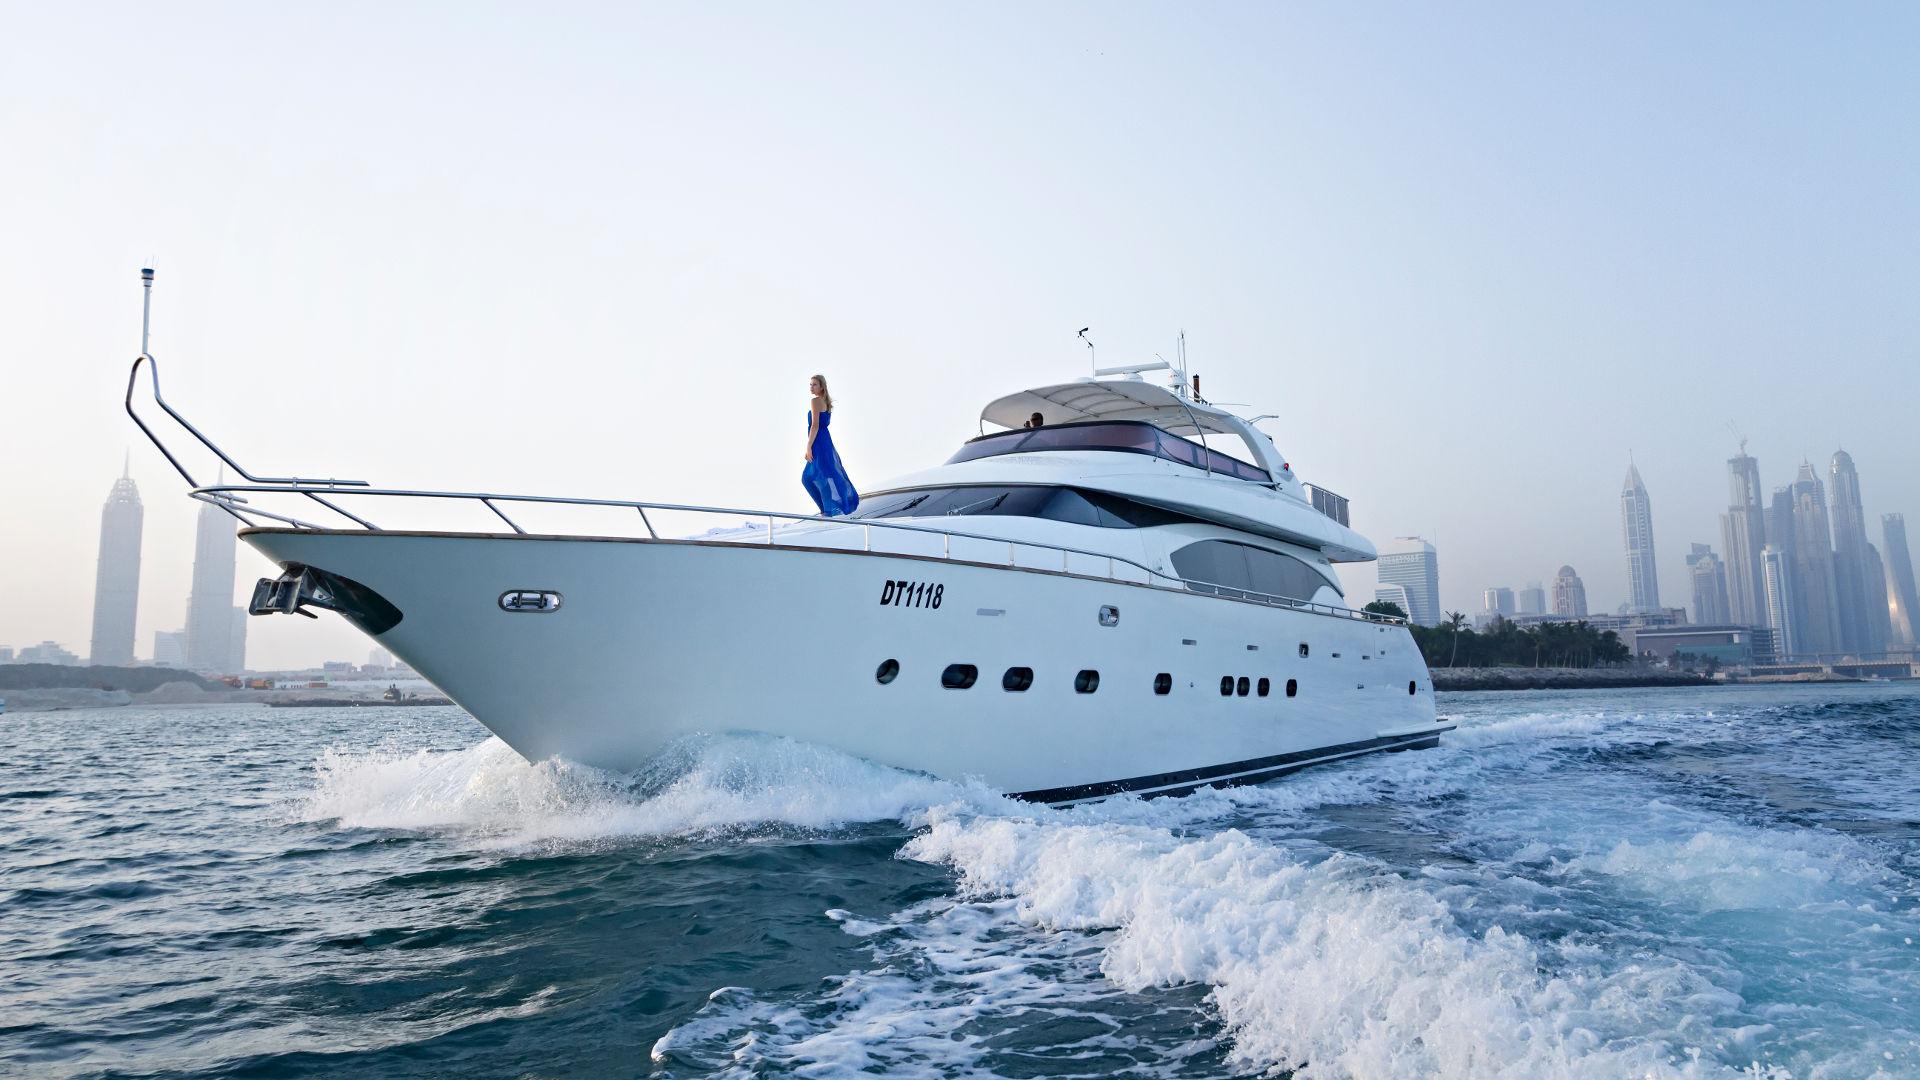 Xclusive Yachts - Yacht Rental Dubai, Luxury Yacht Charter